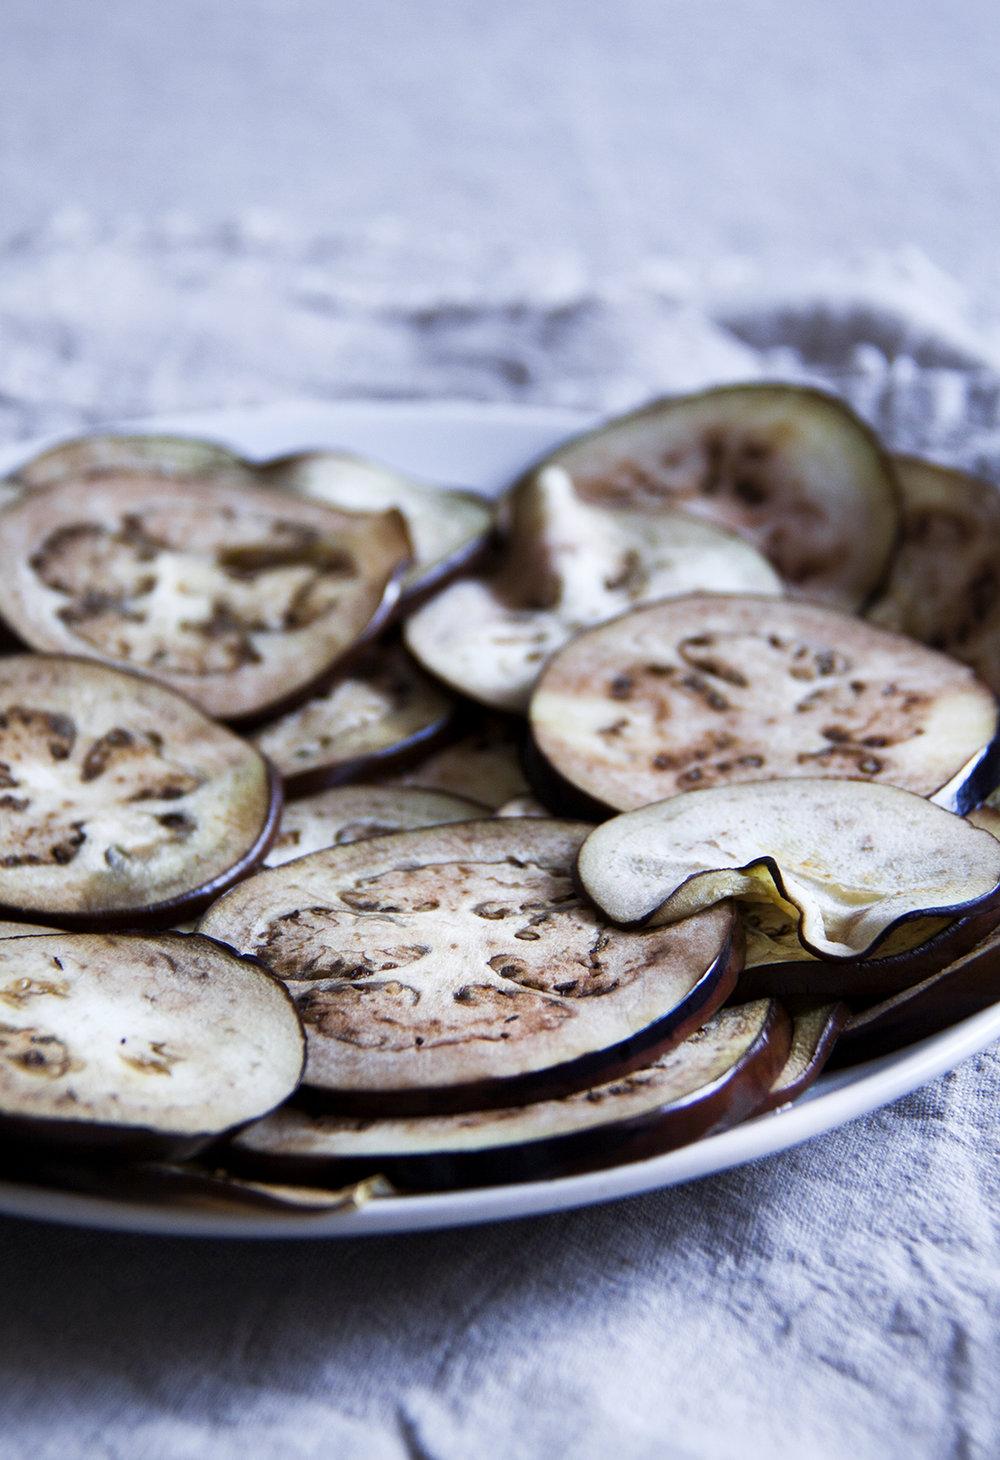 lasagne-champignonragu-hennep-bechamel-vegan-whole-foods-olievrij-02.jpg